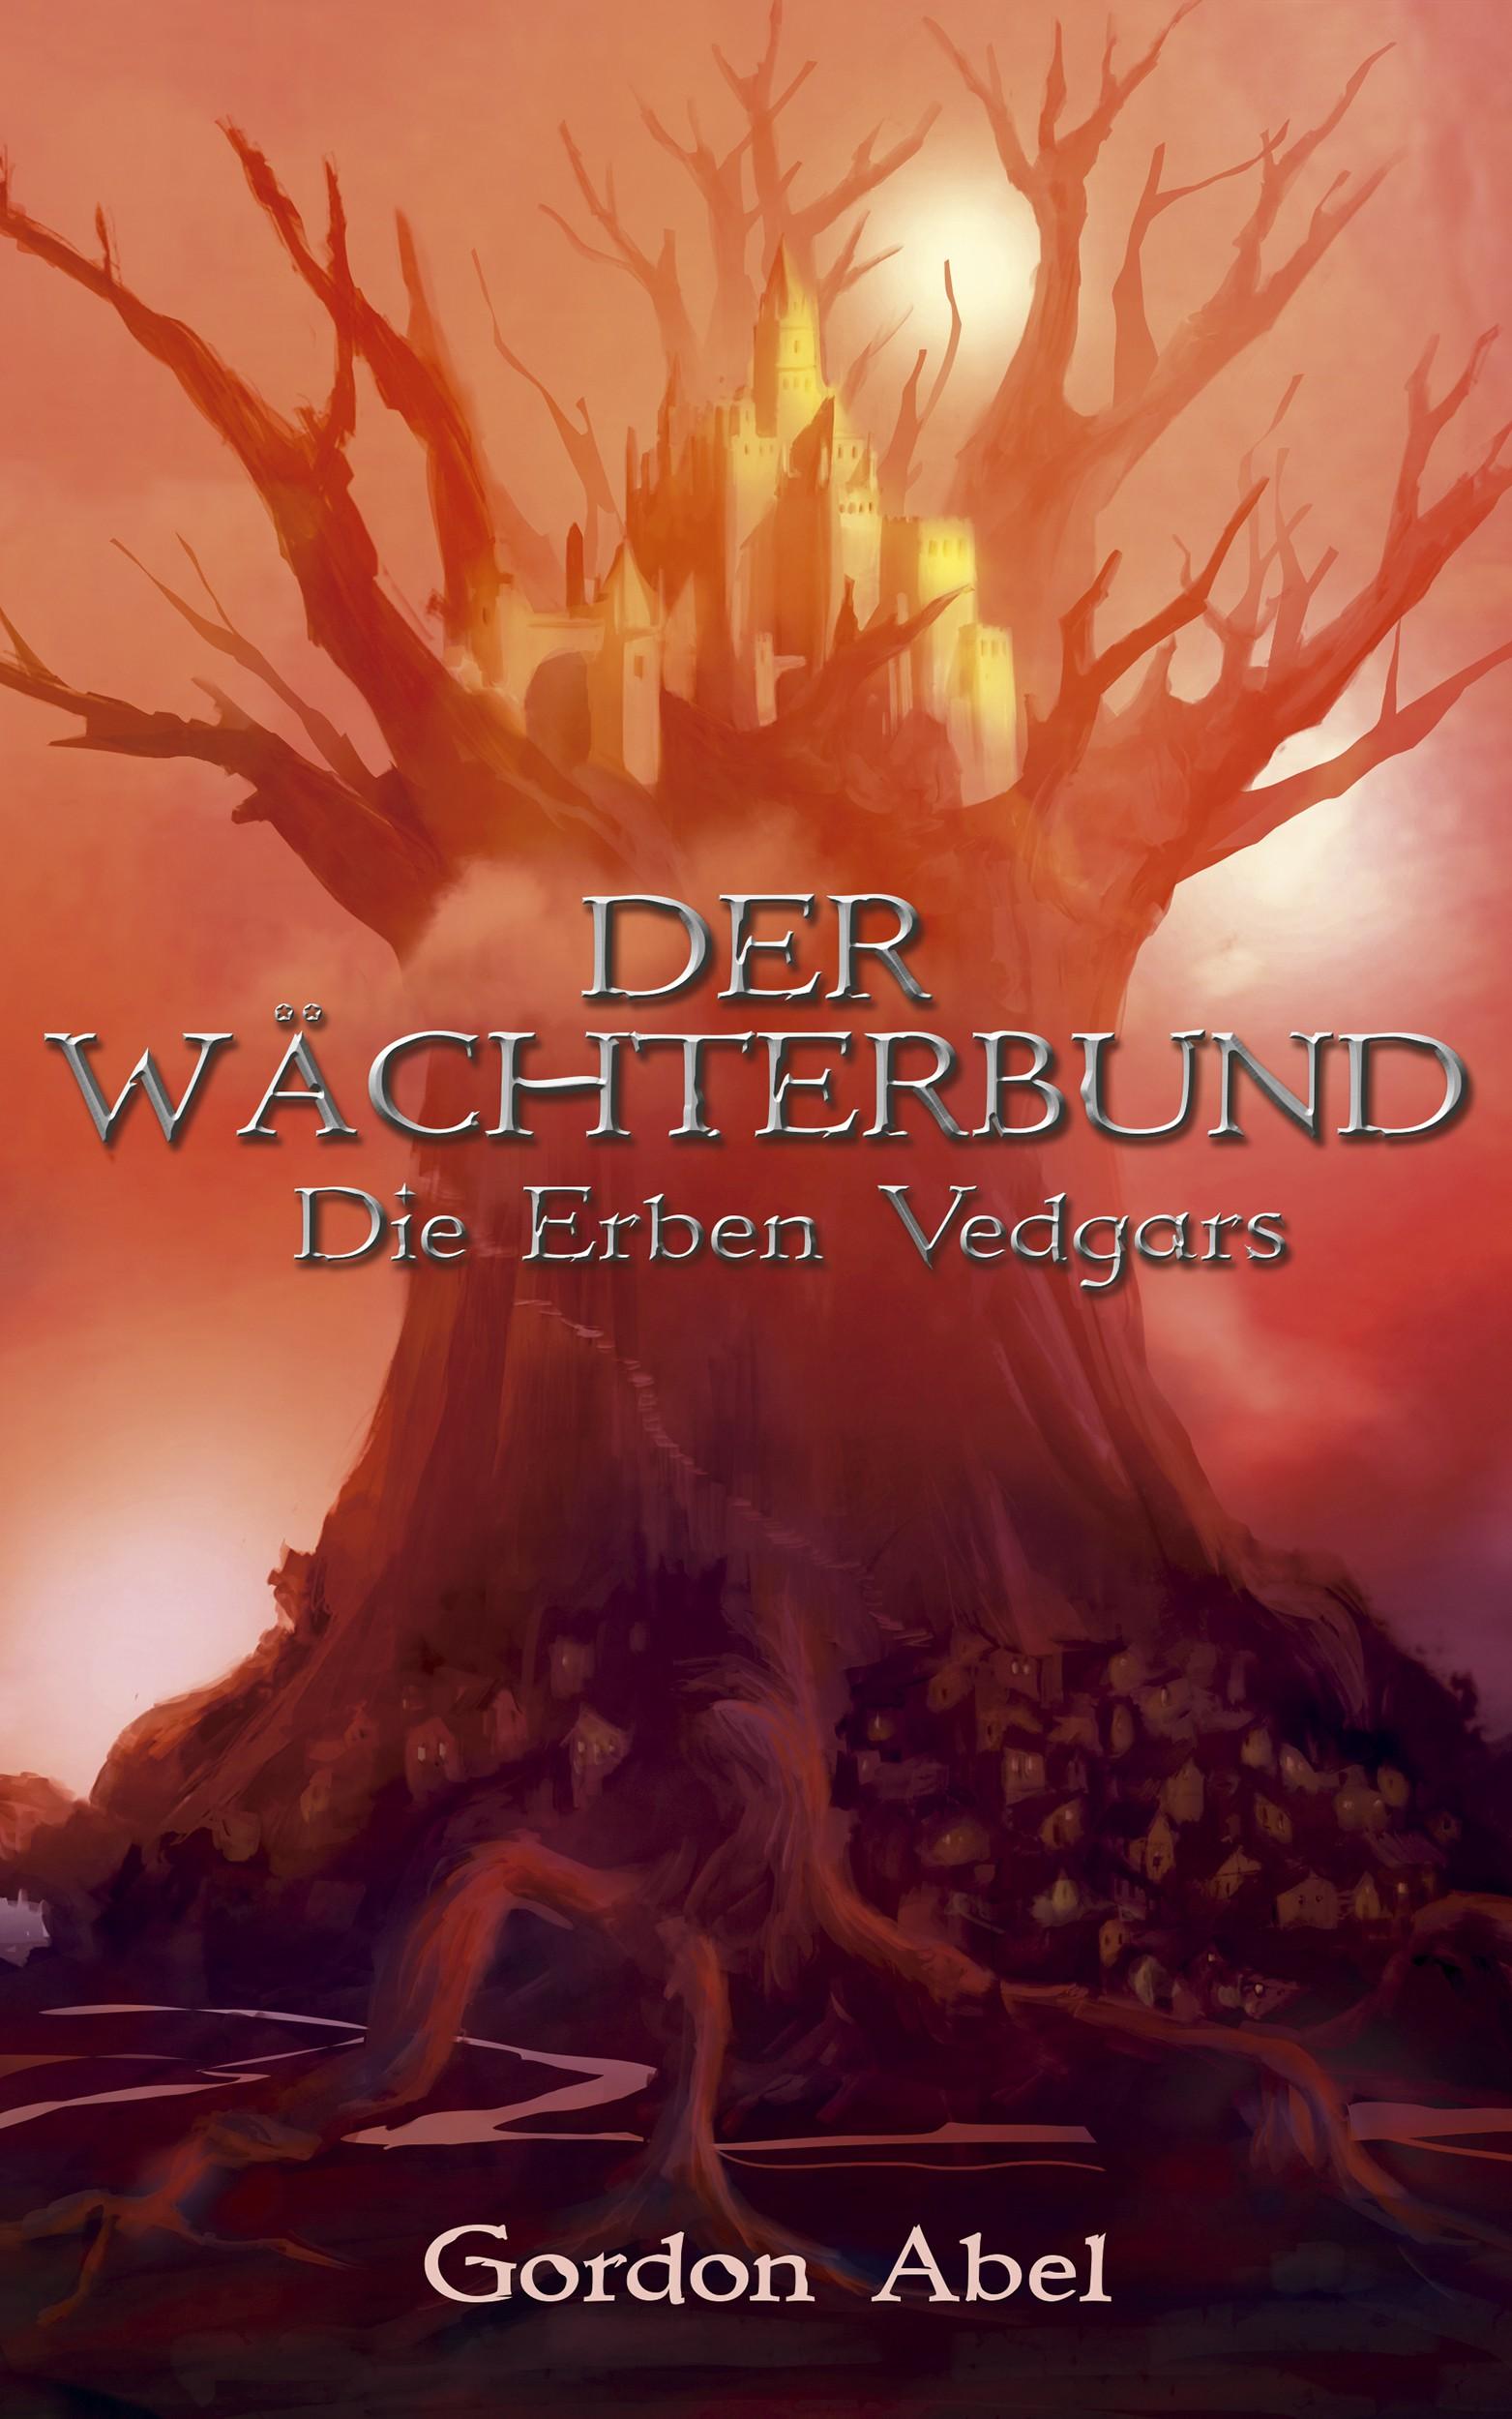 E-book-Cover for a High Fantasy novel